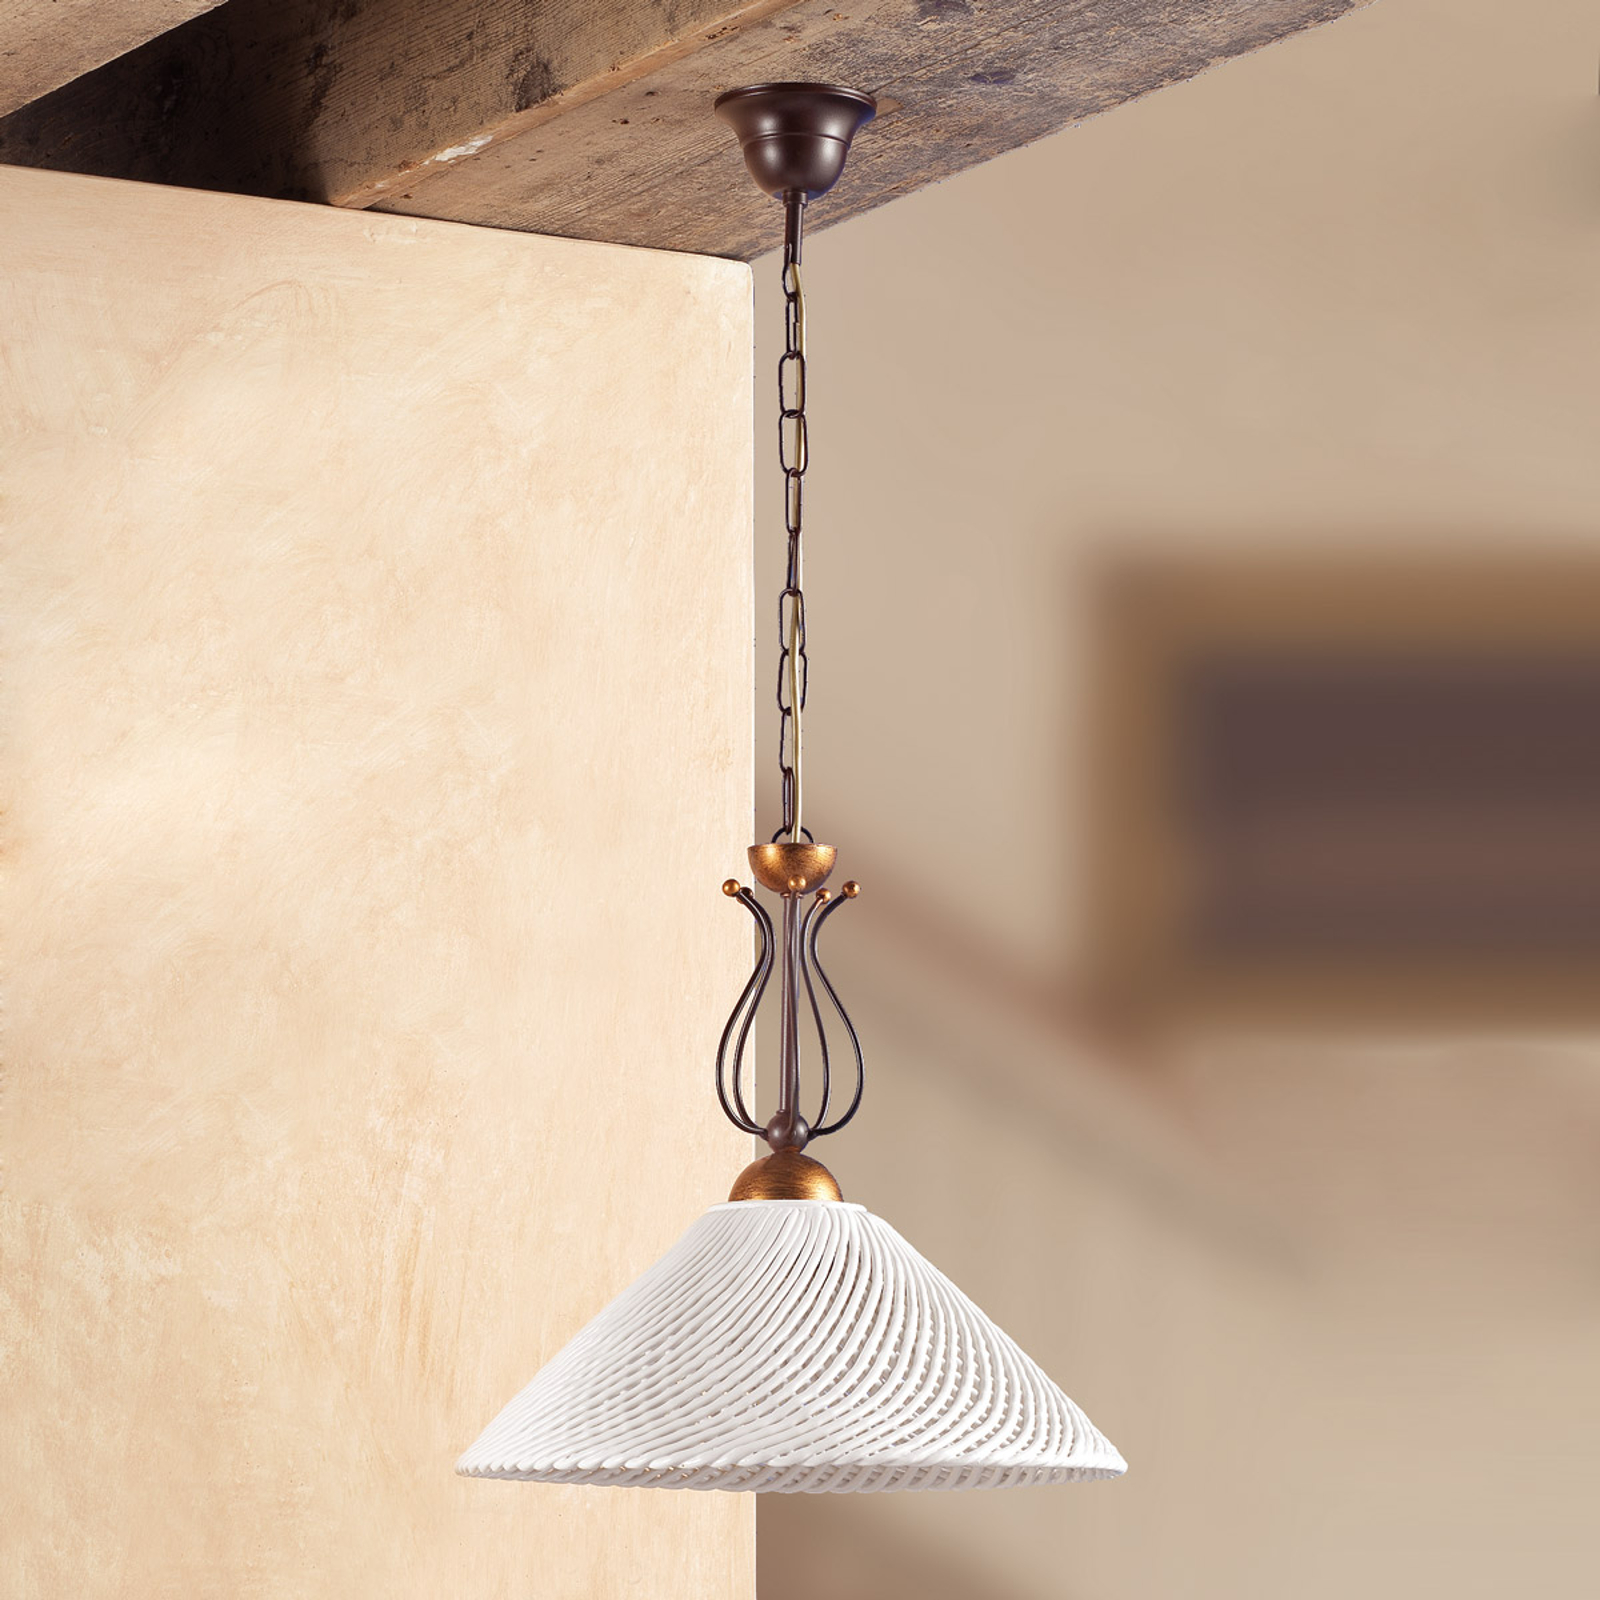 Stijlvolle hanglamp RETINA